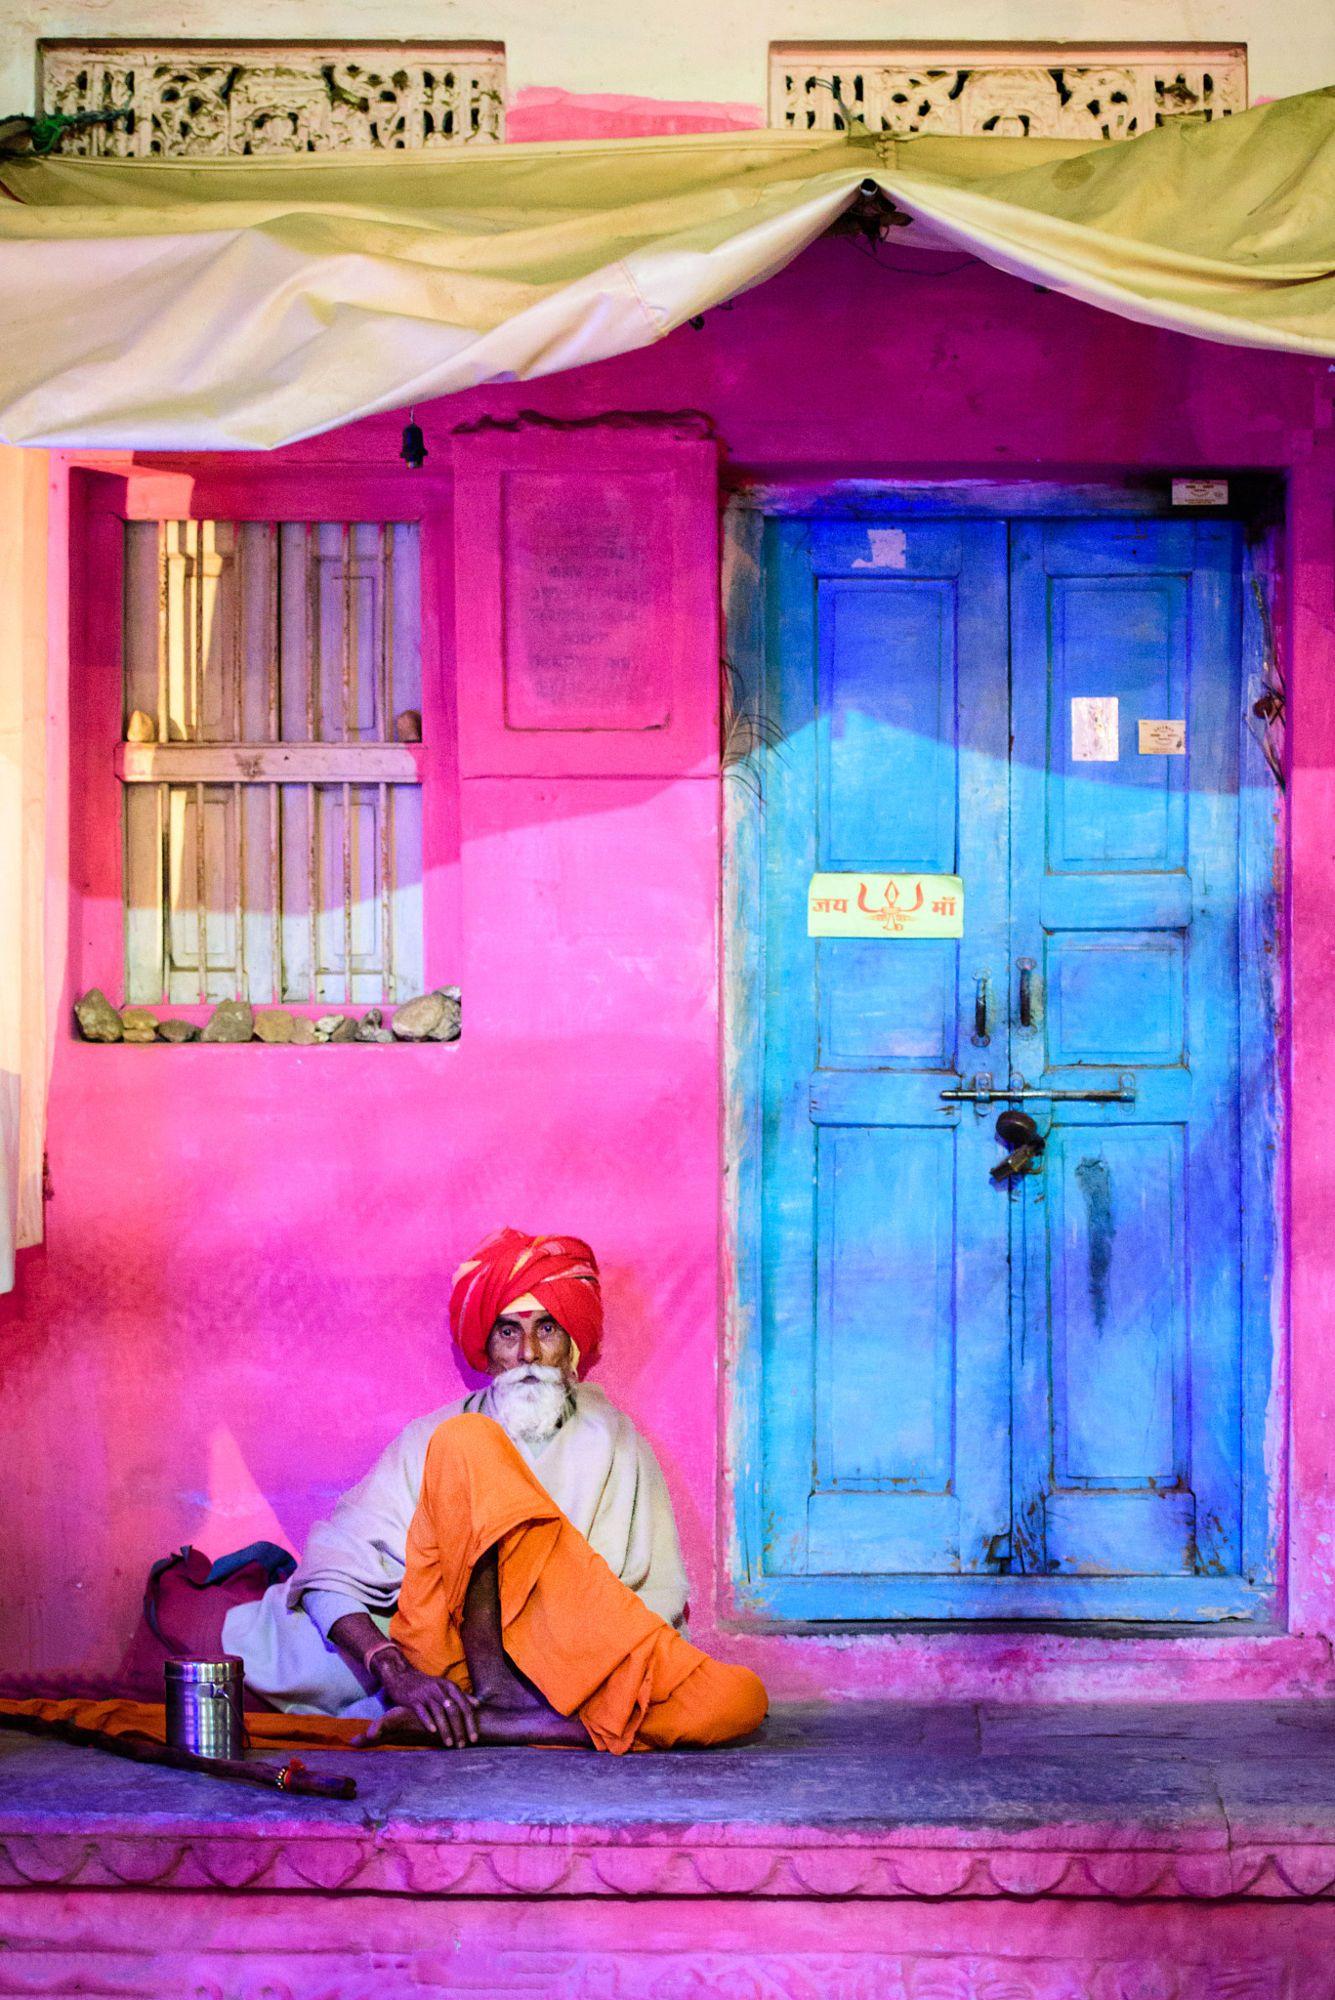 House of colours, Jodphur, India | india | Pinterest | India, India ...